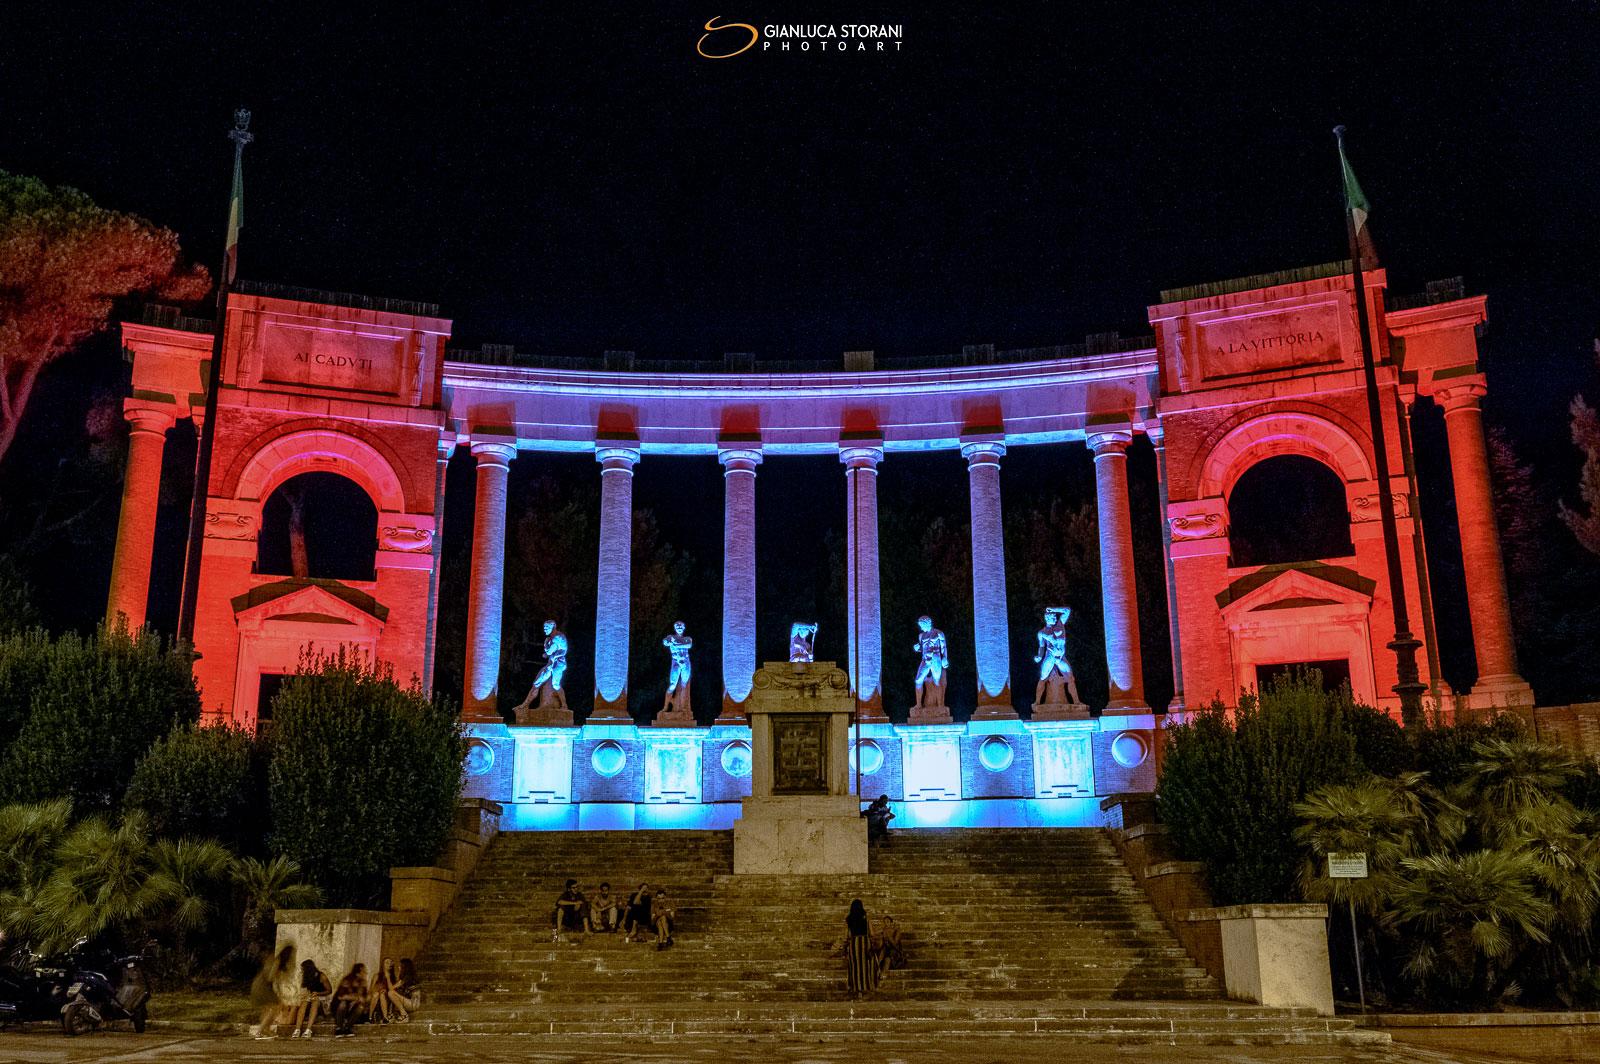 Notte dell'Opera 2017 - Gianluca Storani Photo Art (ID: 4-1422)